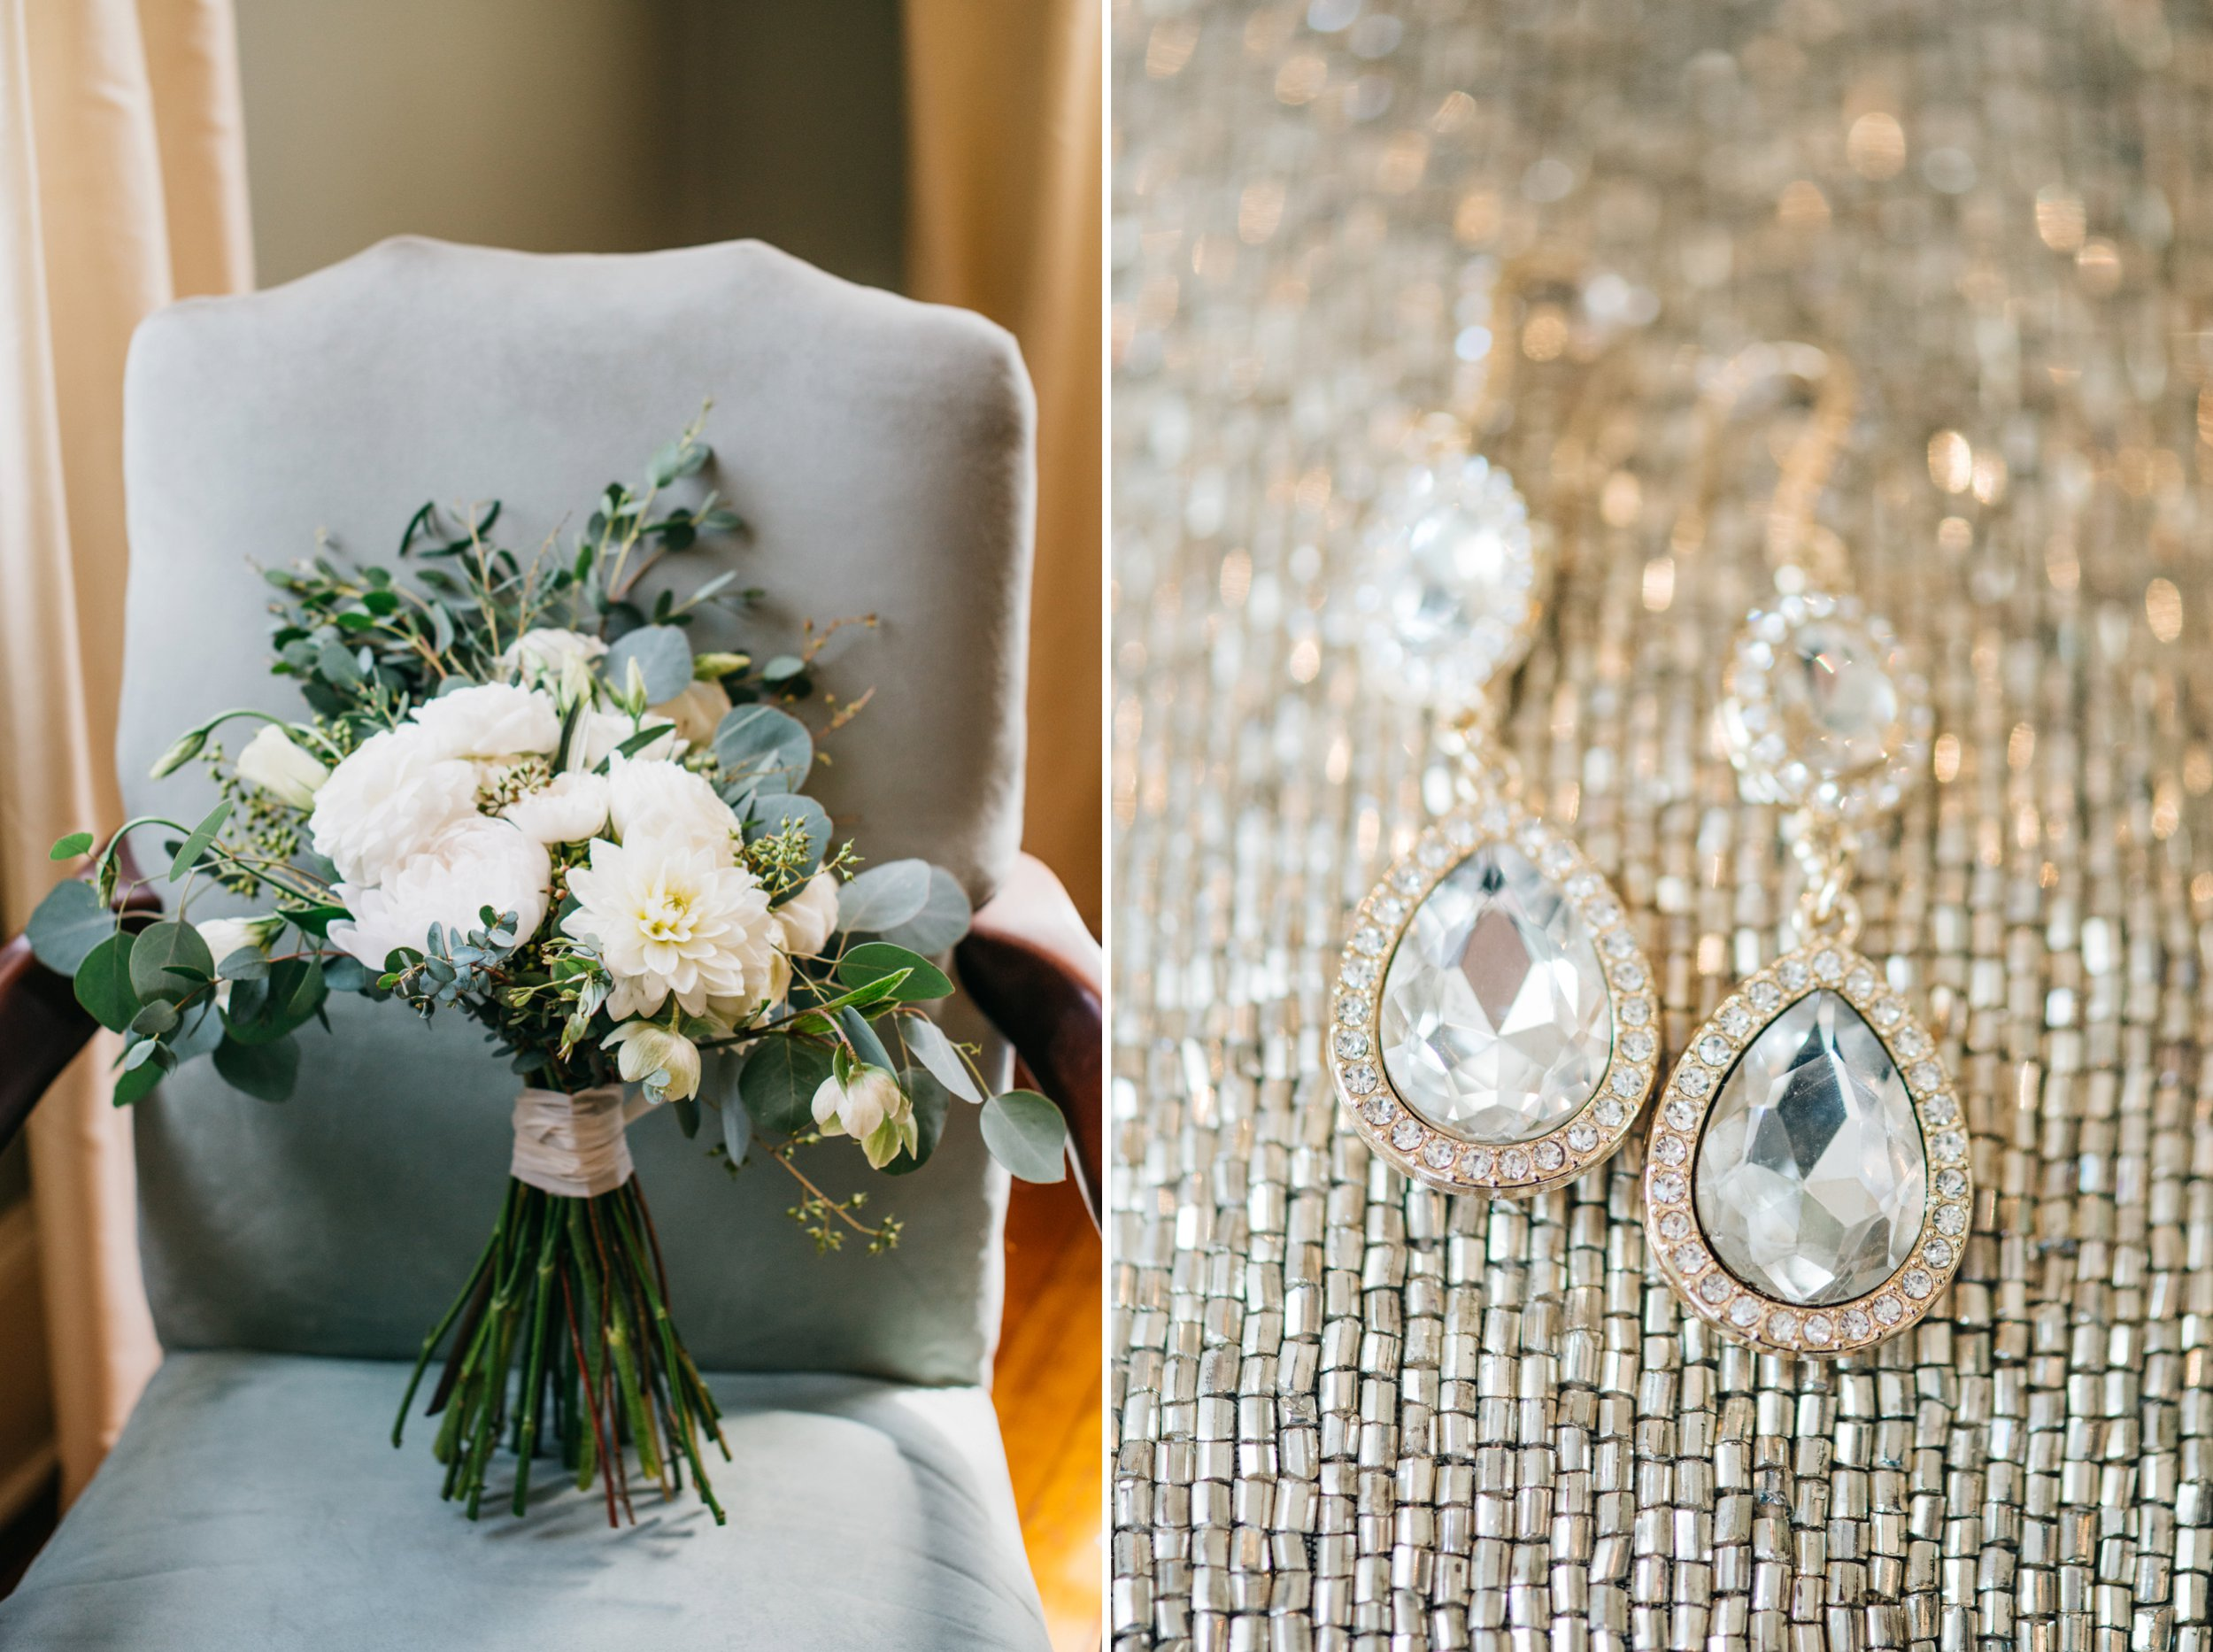 legare-waring-house-wedding-6.jpg